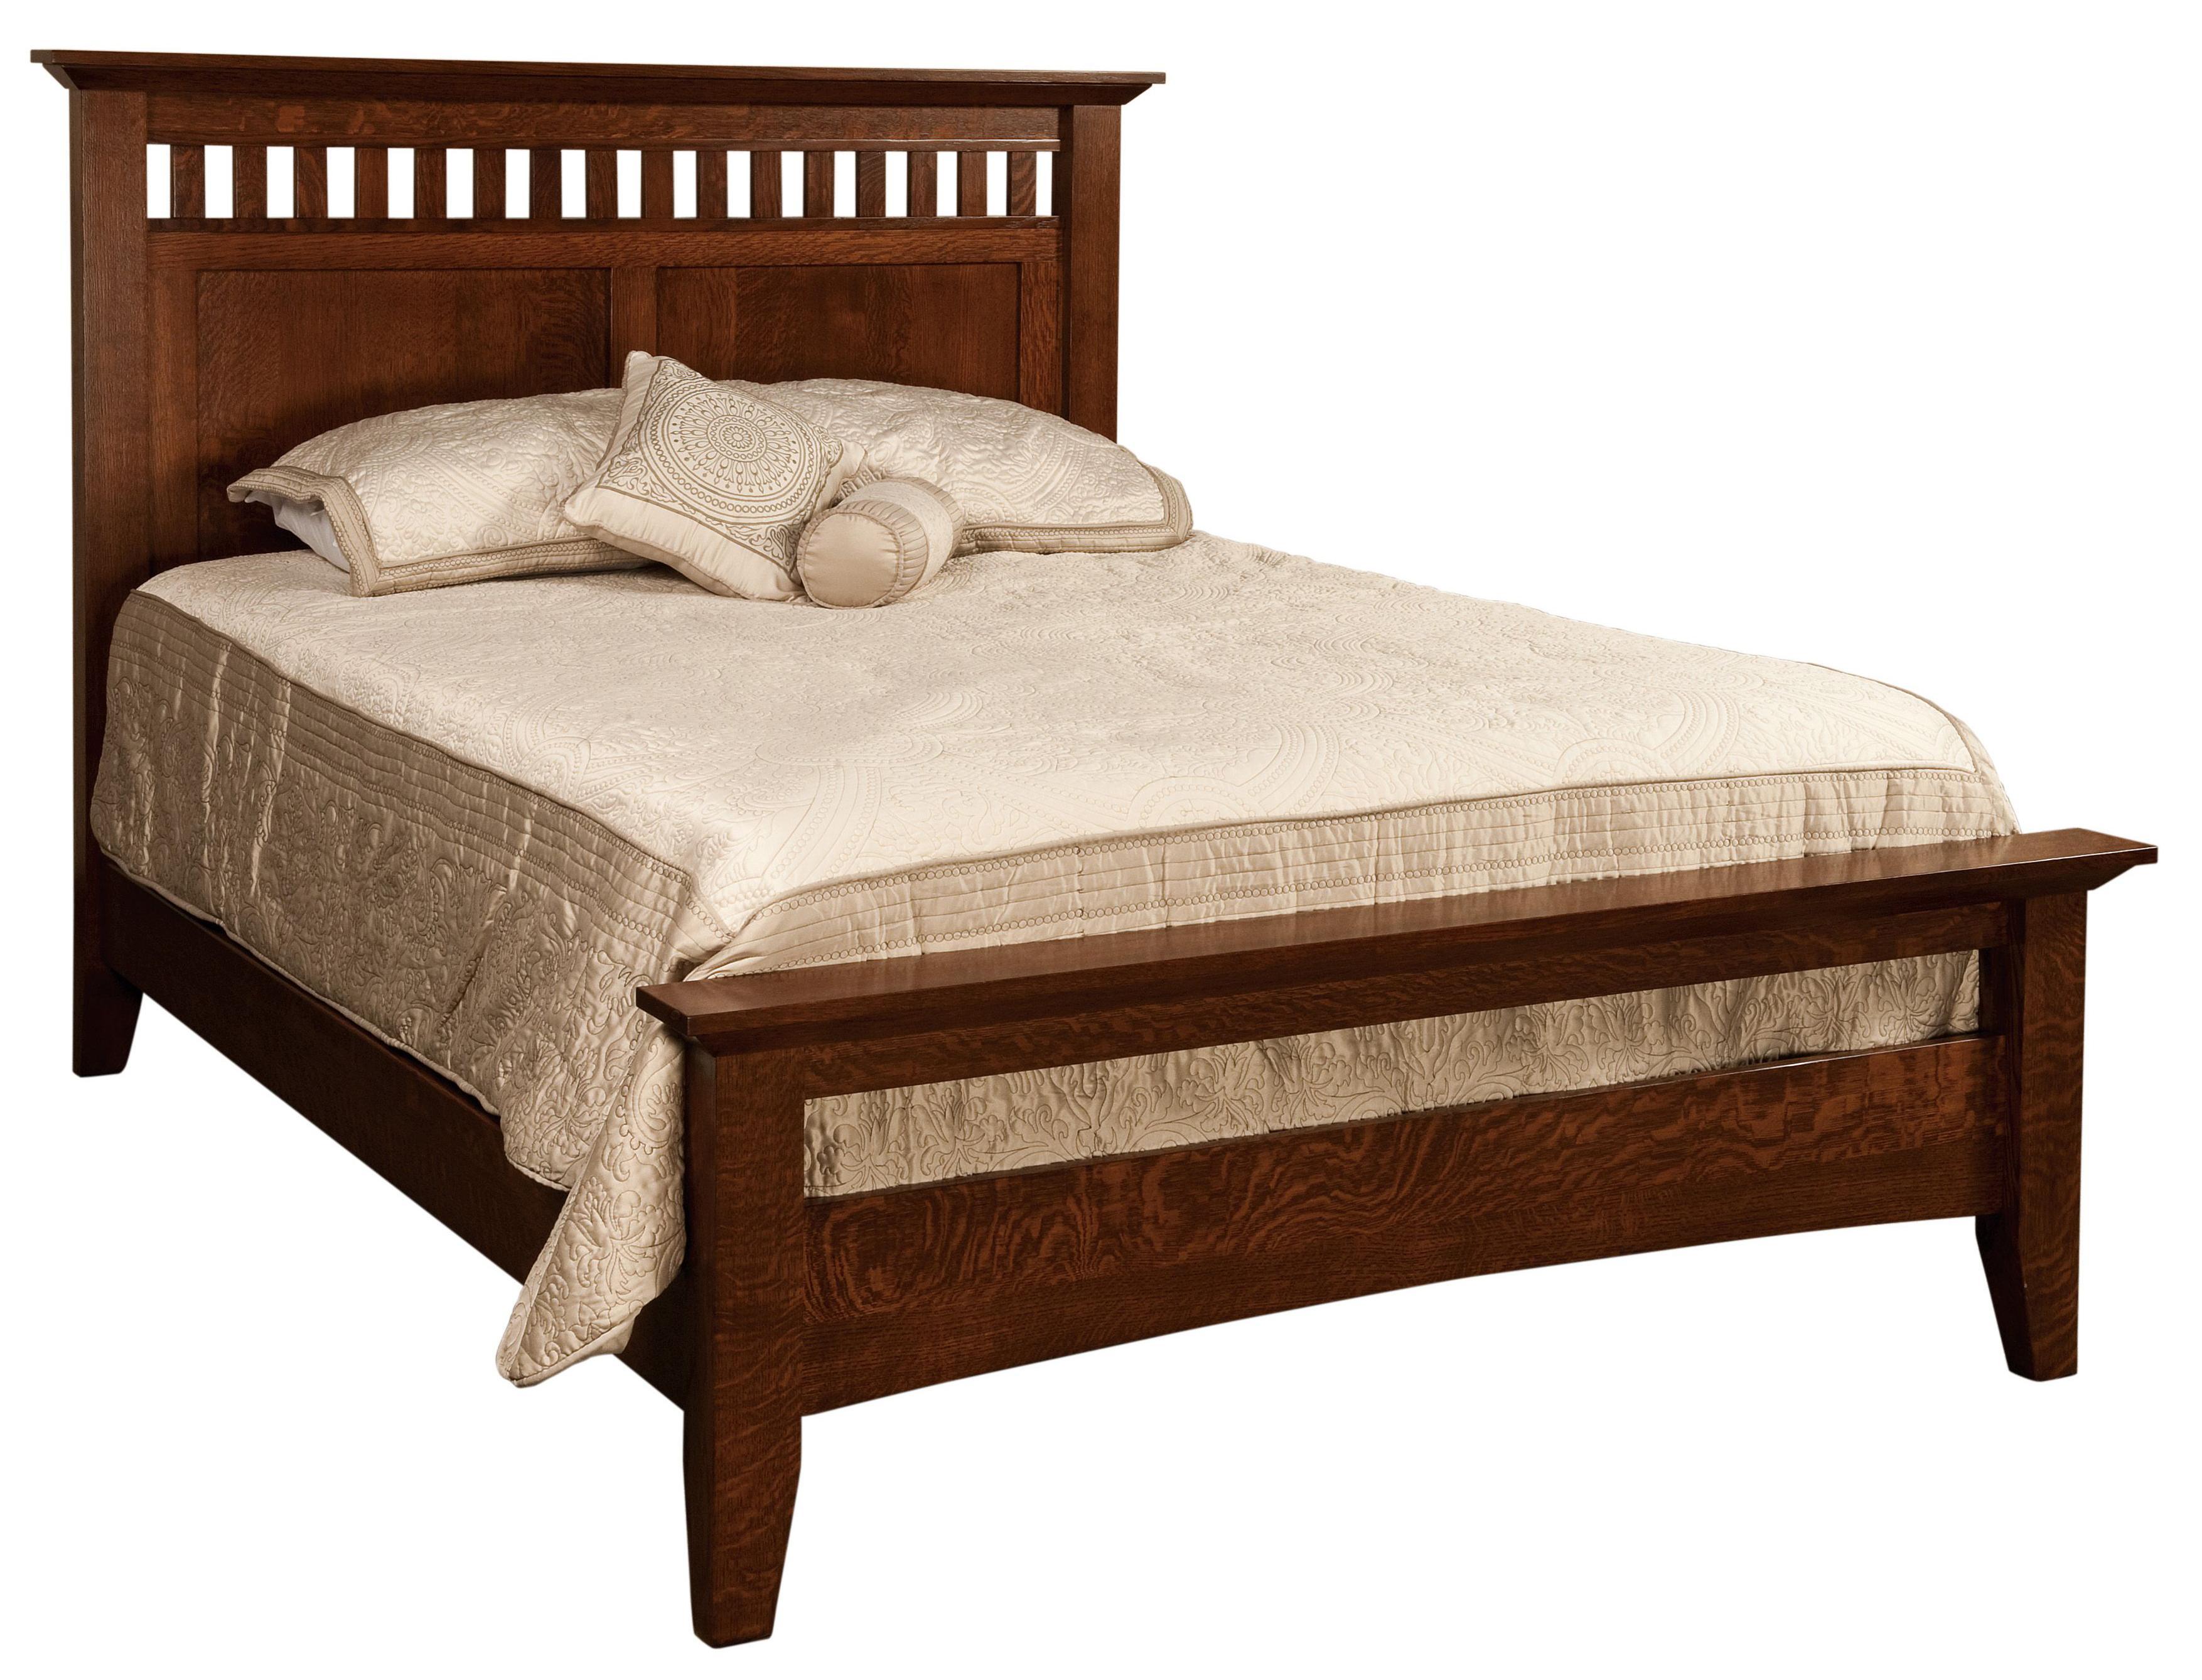 Morris Home Savannah Savannah King Panel Bed - Item Number: SHKB-XX